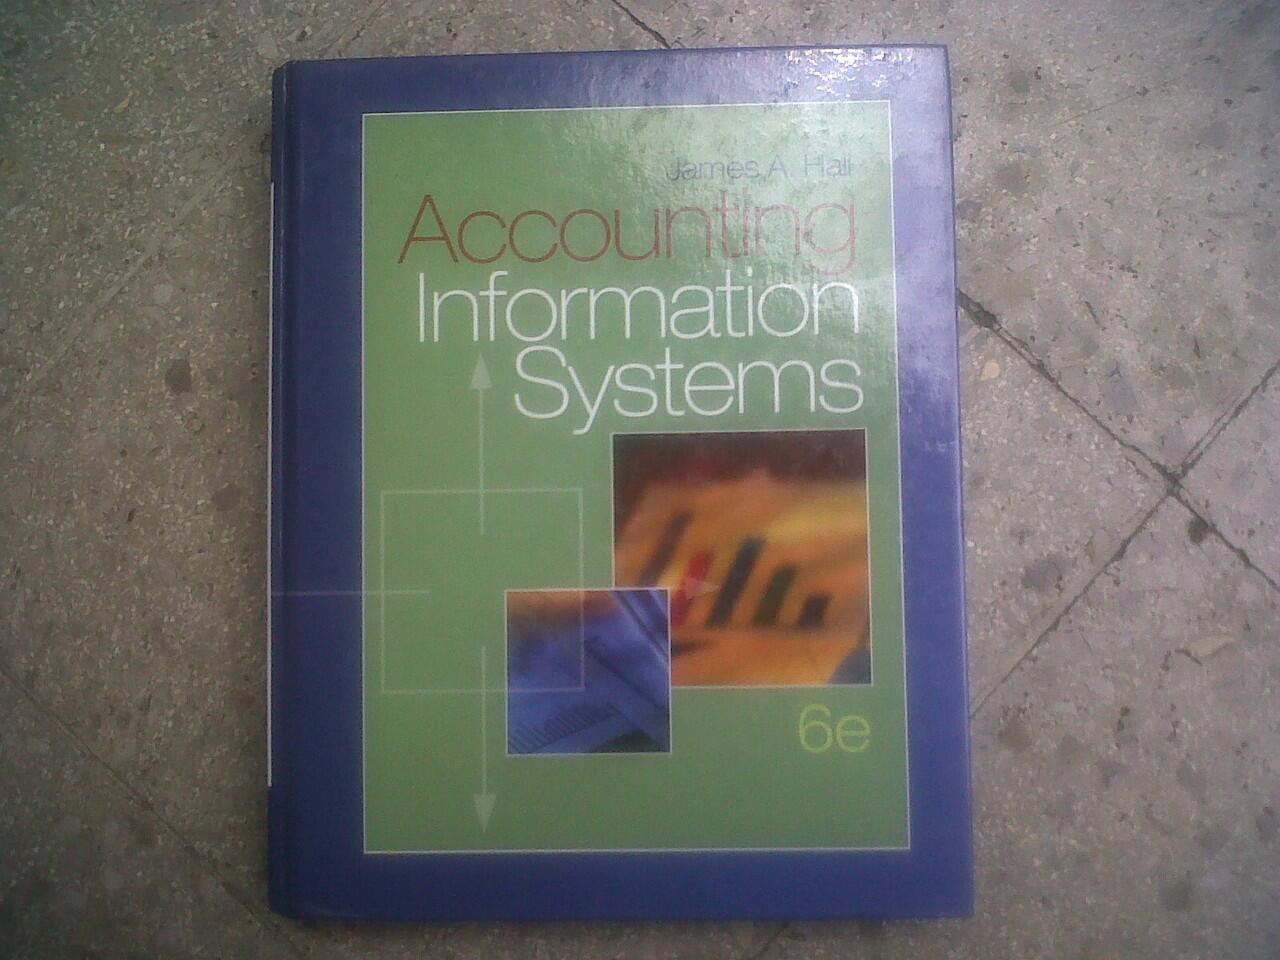 Buku accounting information sustem james A. hall